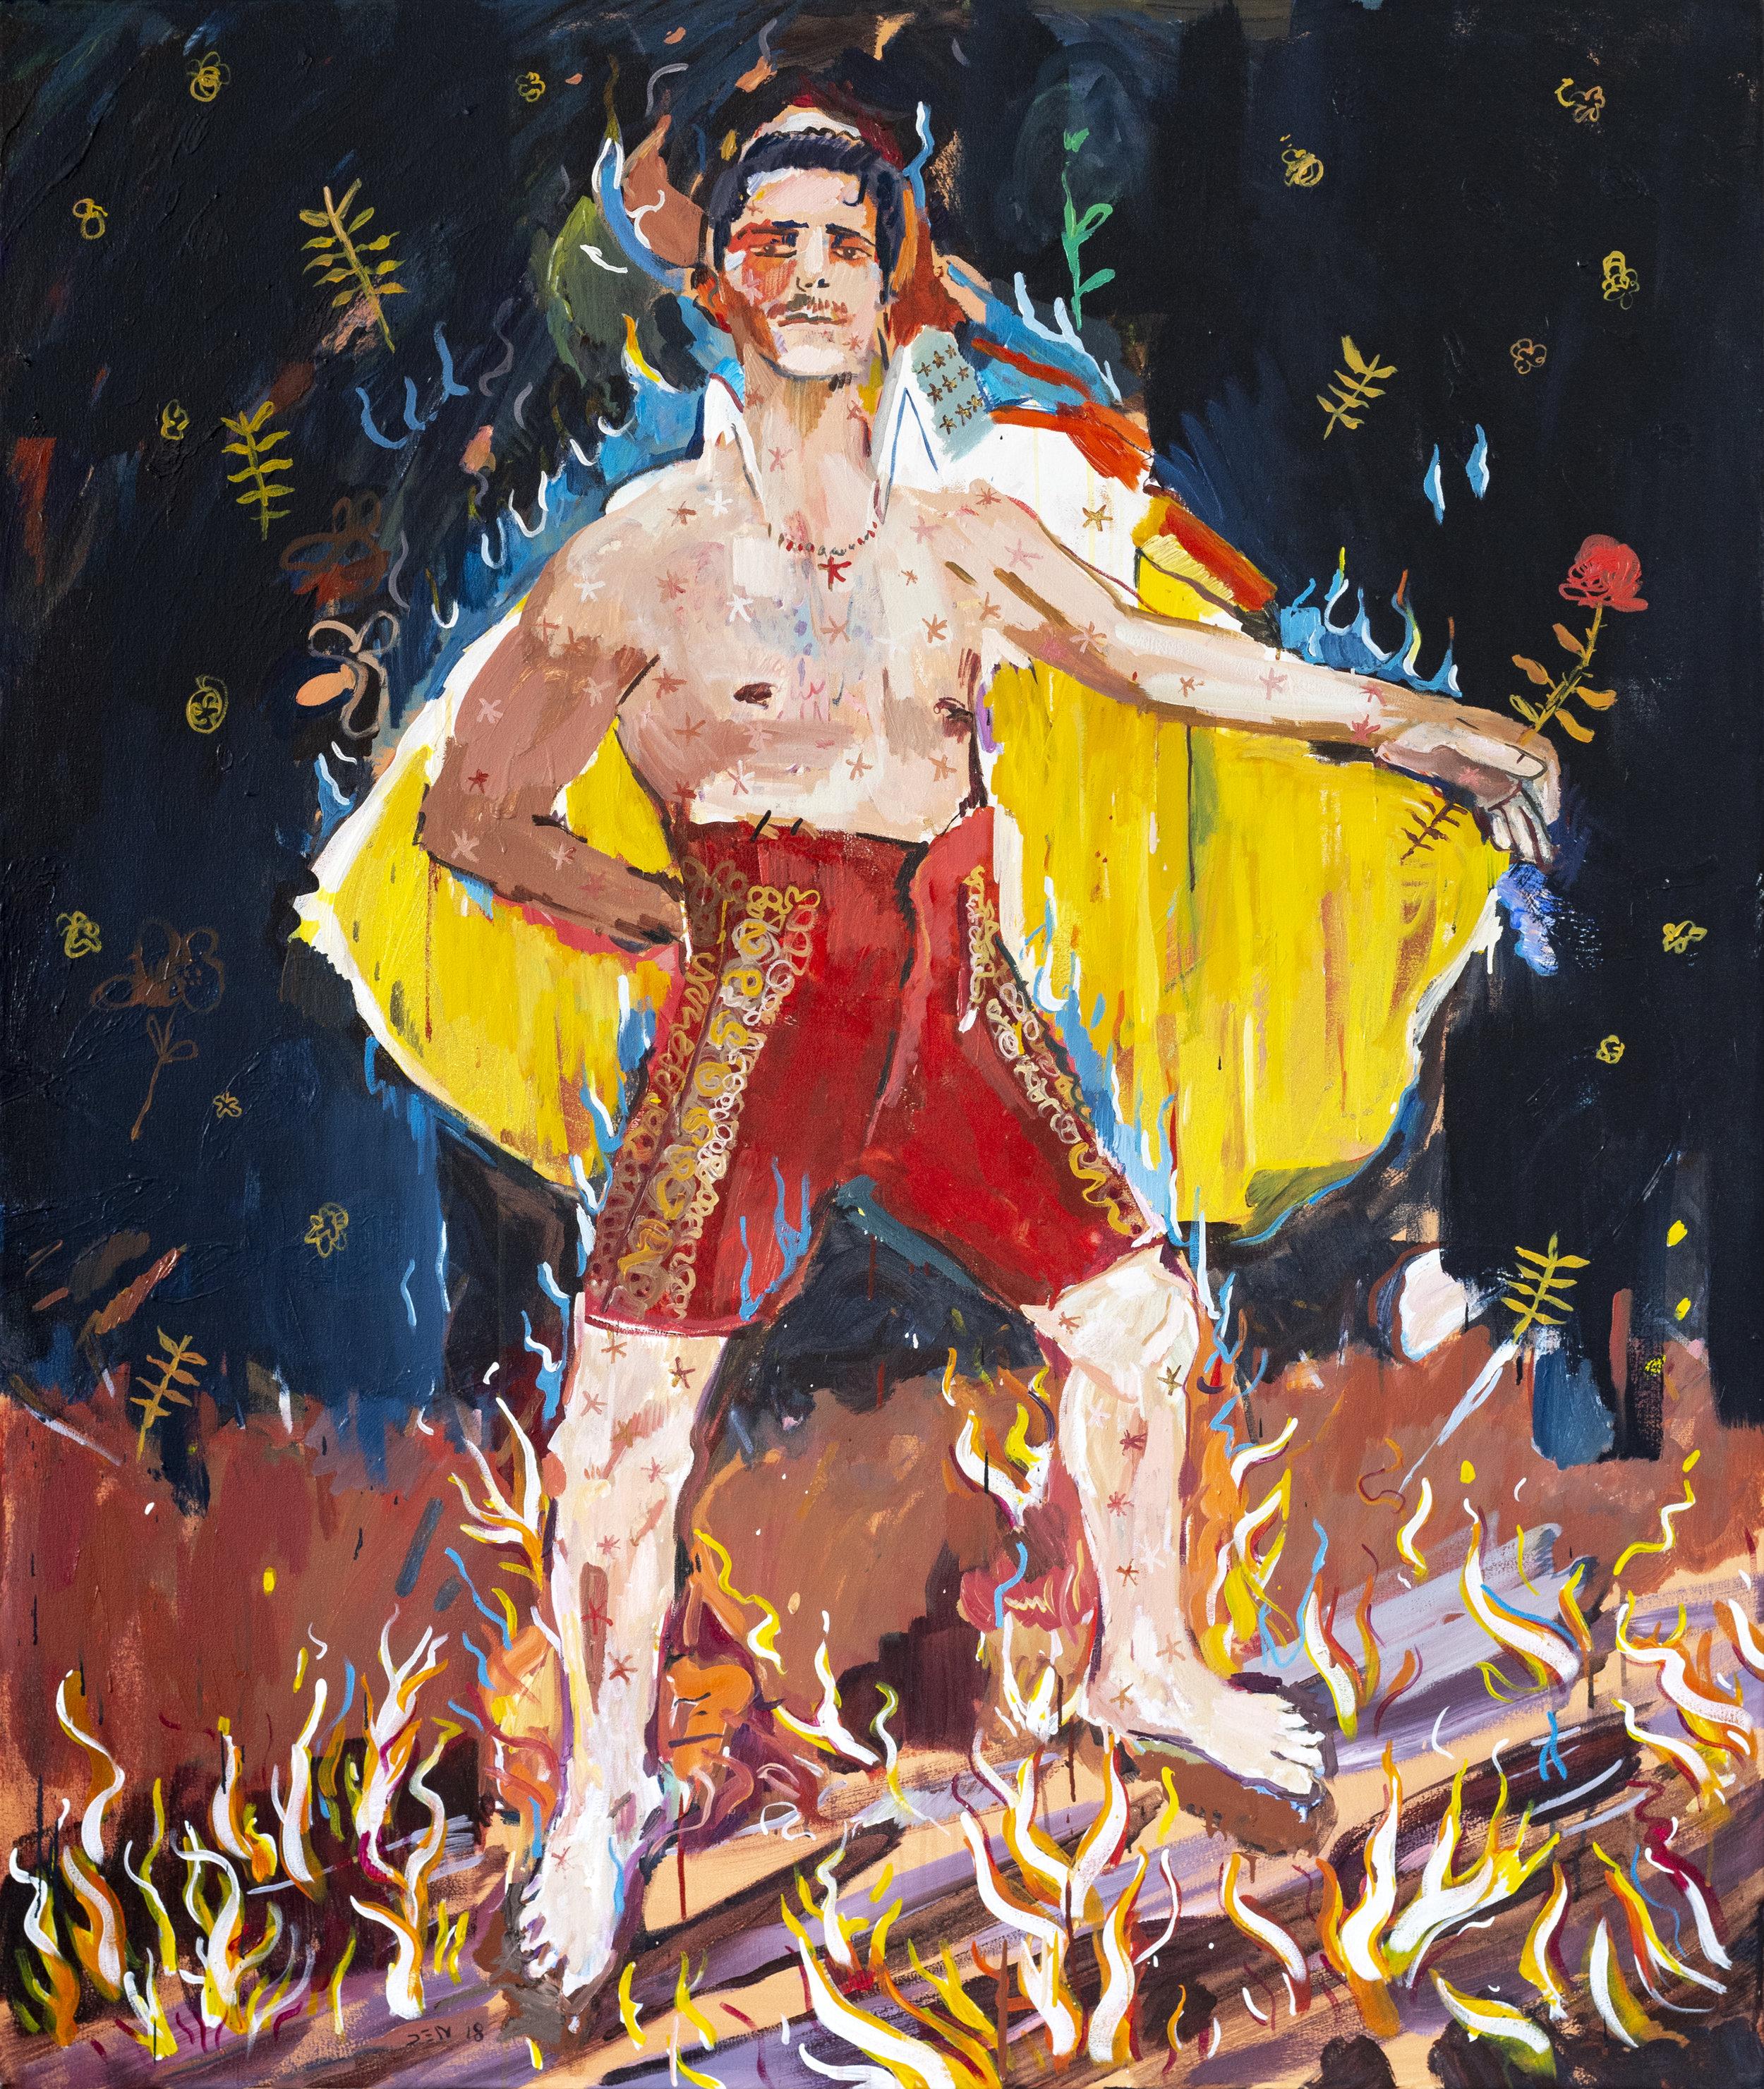 Devil in the Cape, 2019, Oil on Canvas, 140cm x 165cm